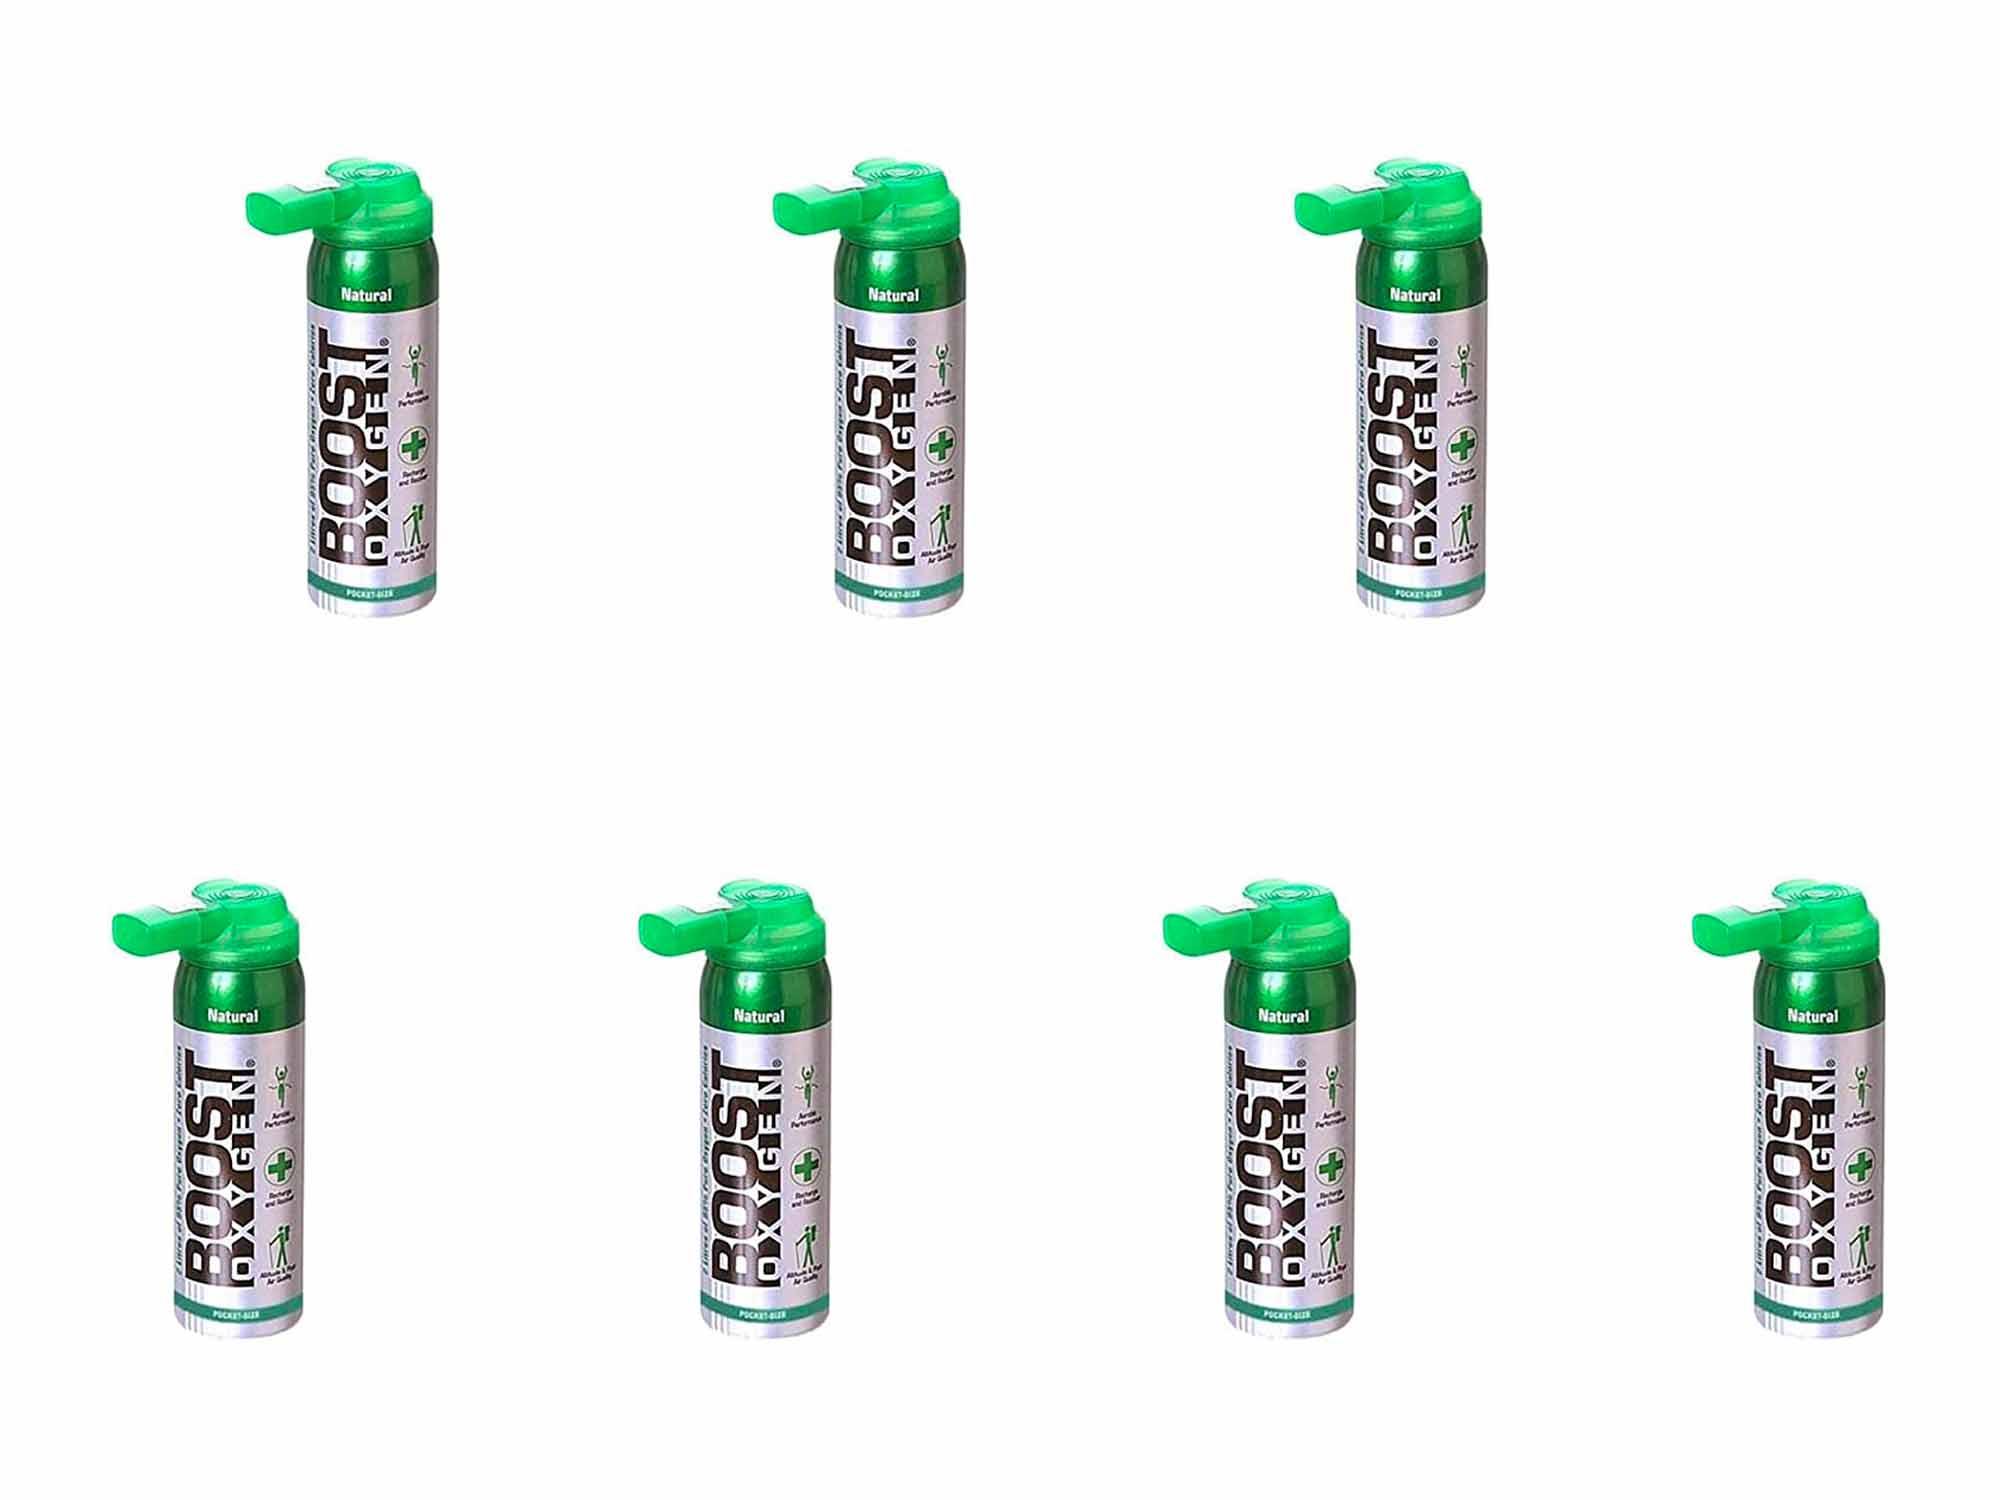 Boost Oxygen Canned 2-Liter Natural Inhaler O2 Oxygen Canister Bottle for High Altitudes, Athletes, and More, Flavorless